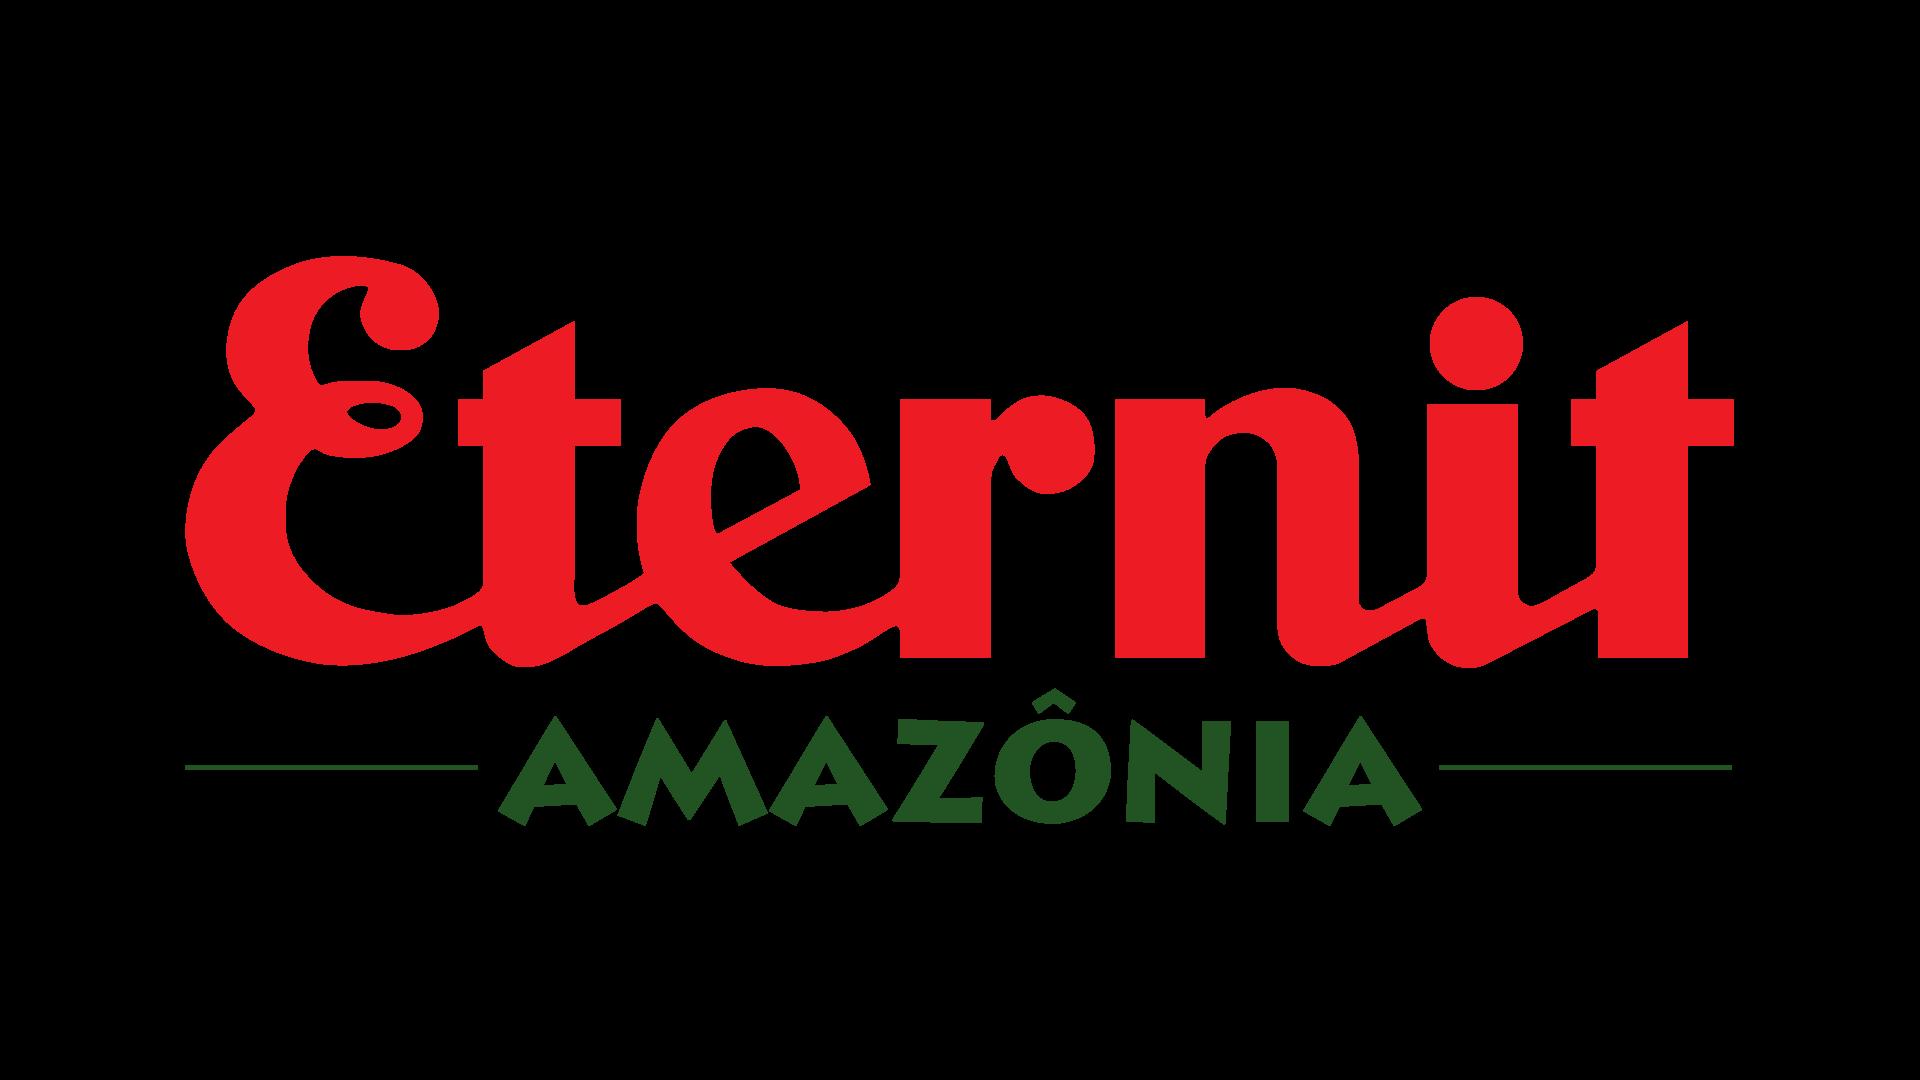 Eternit Amazonia